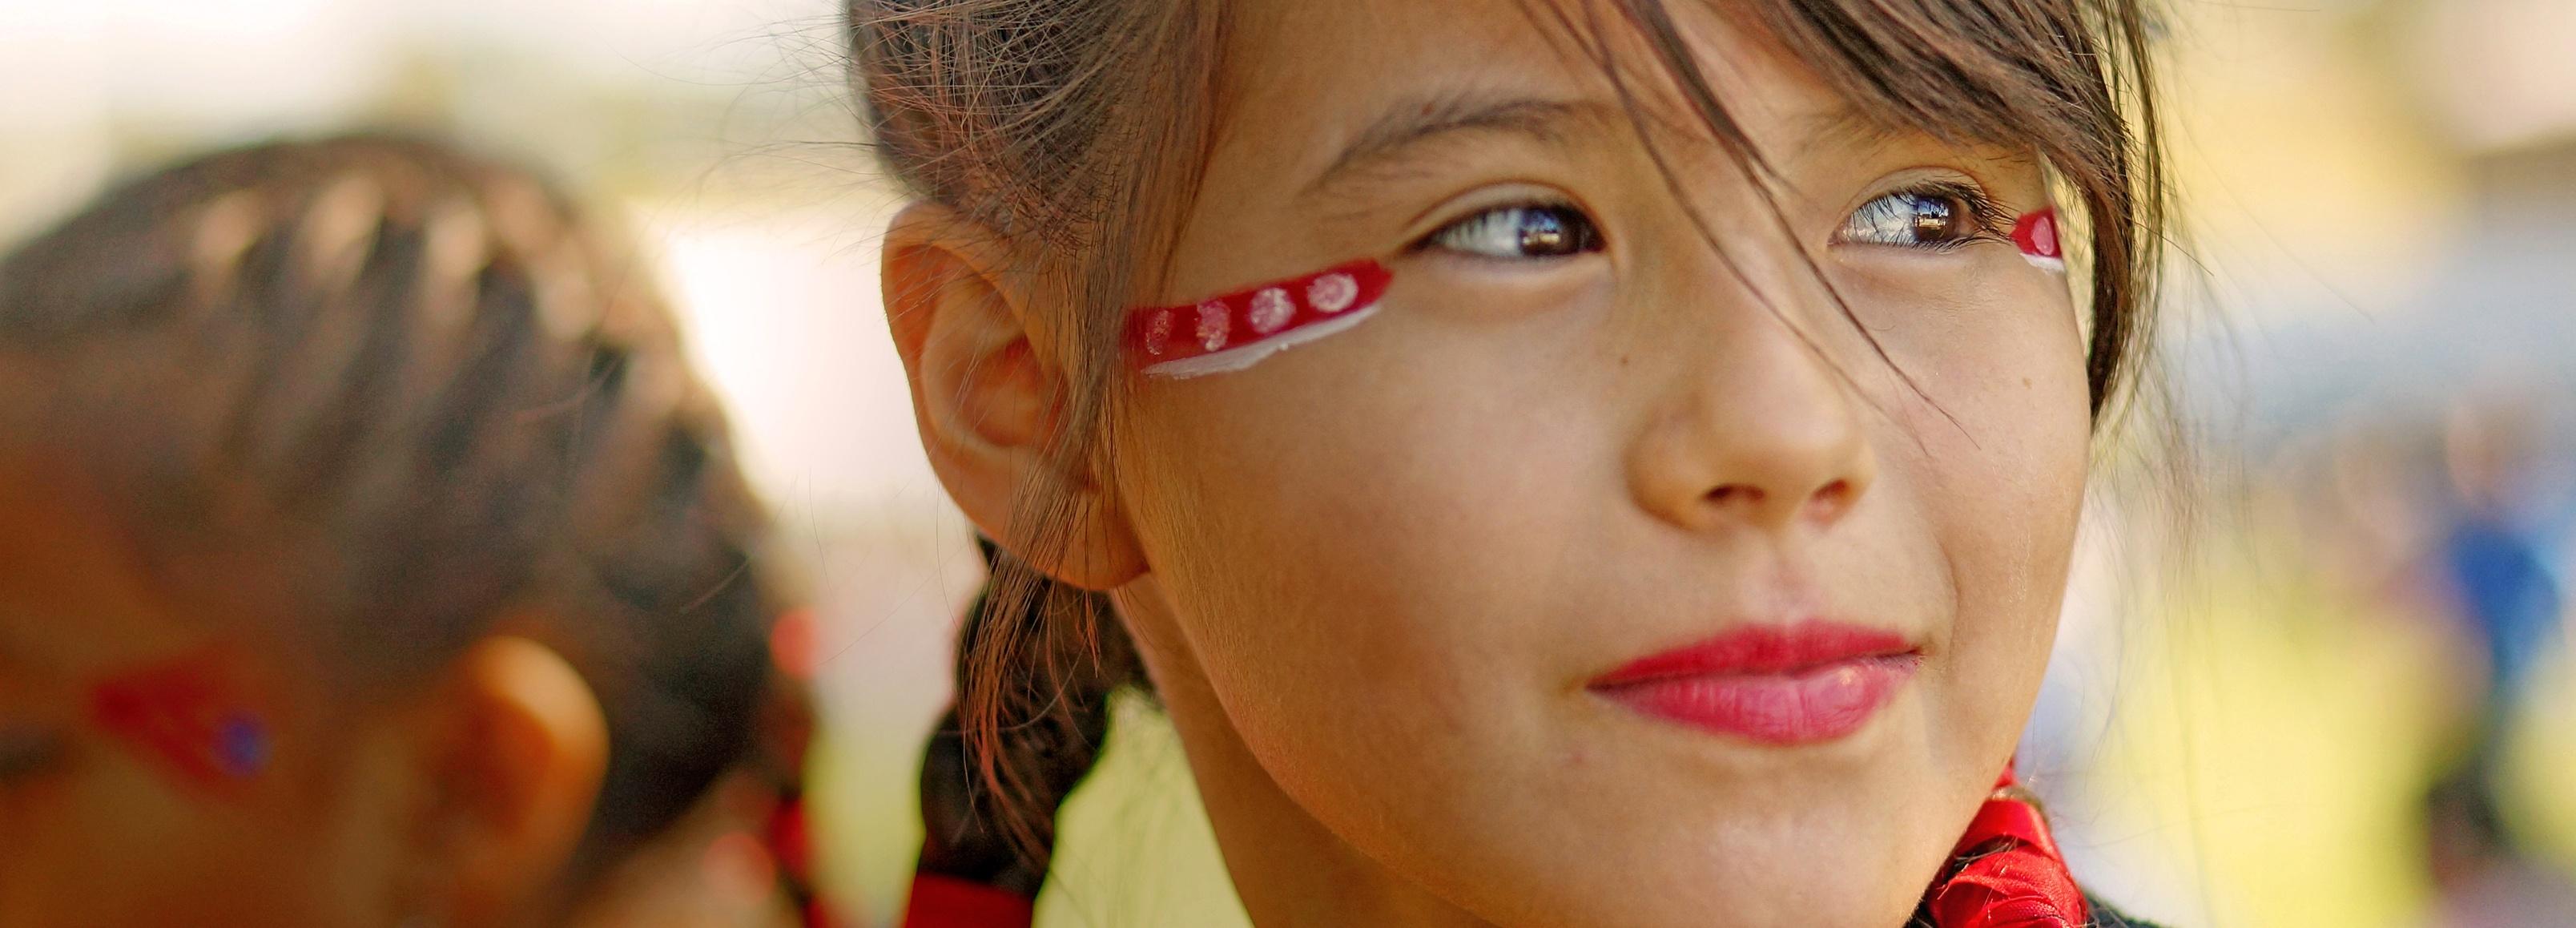 nativeamericanday.jpg